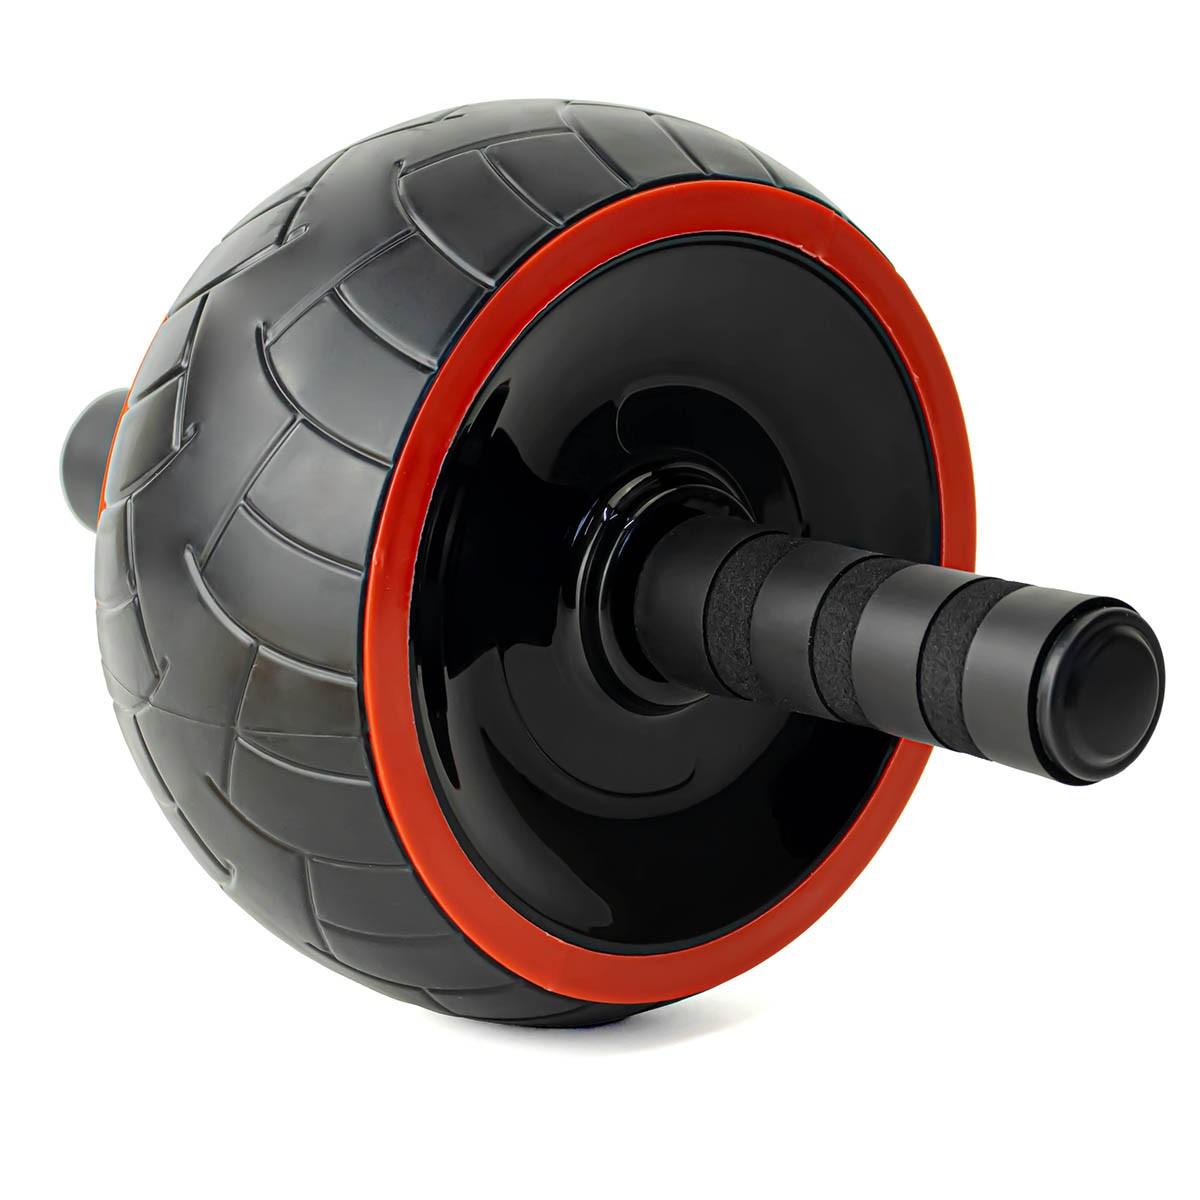 Roda AbWheel Grande para Treino Abdominal Multifuncional MBfit LY87144